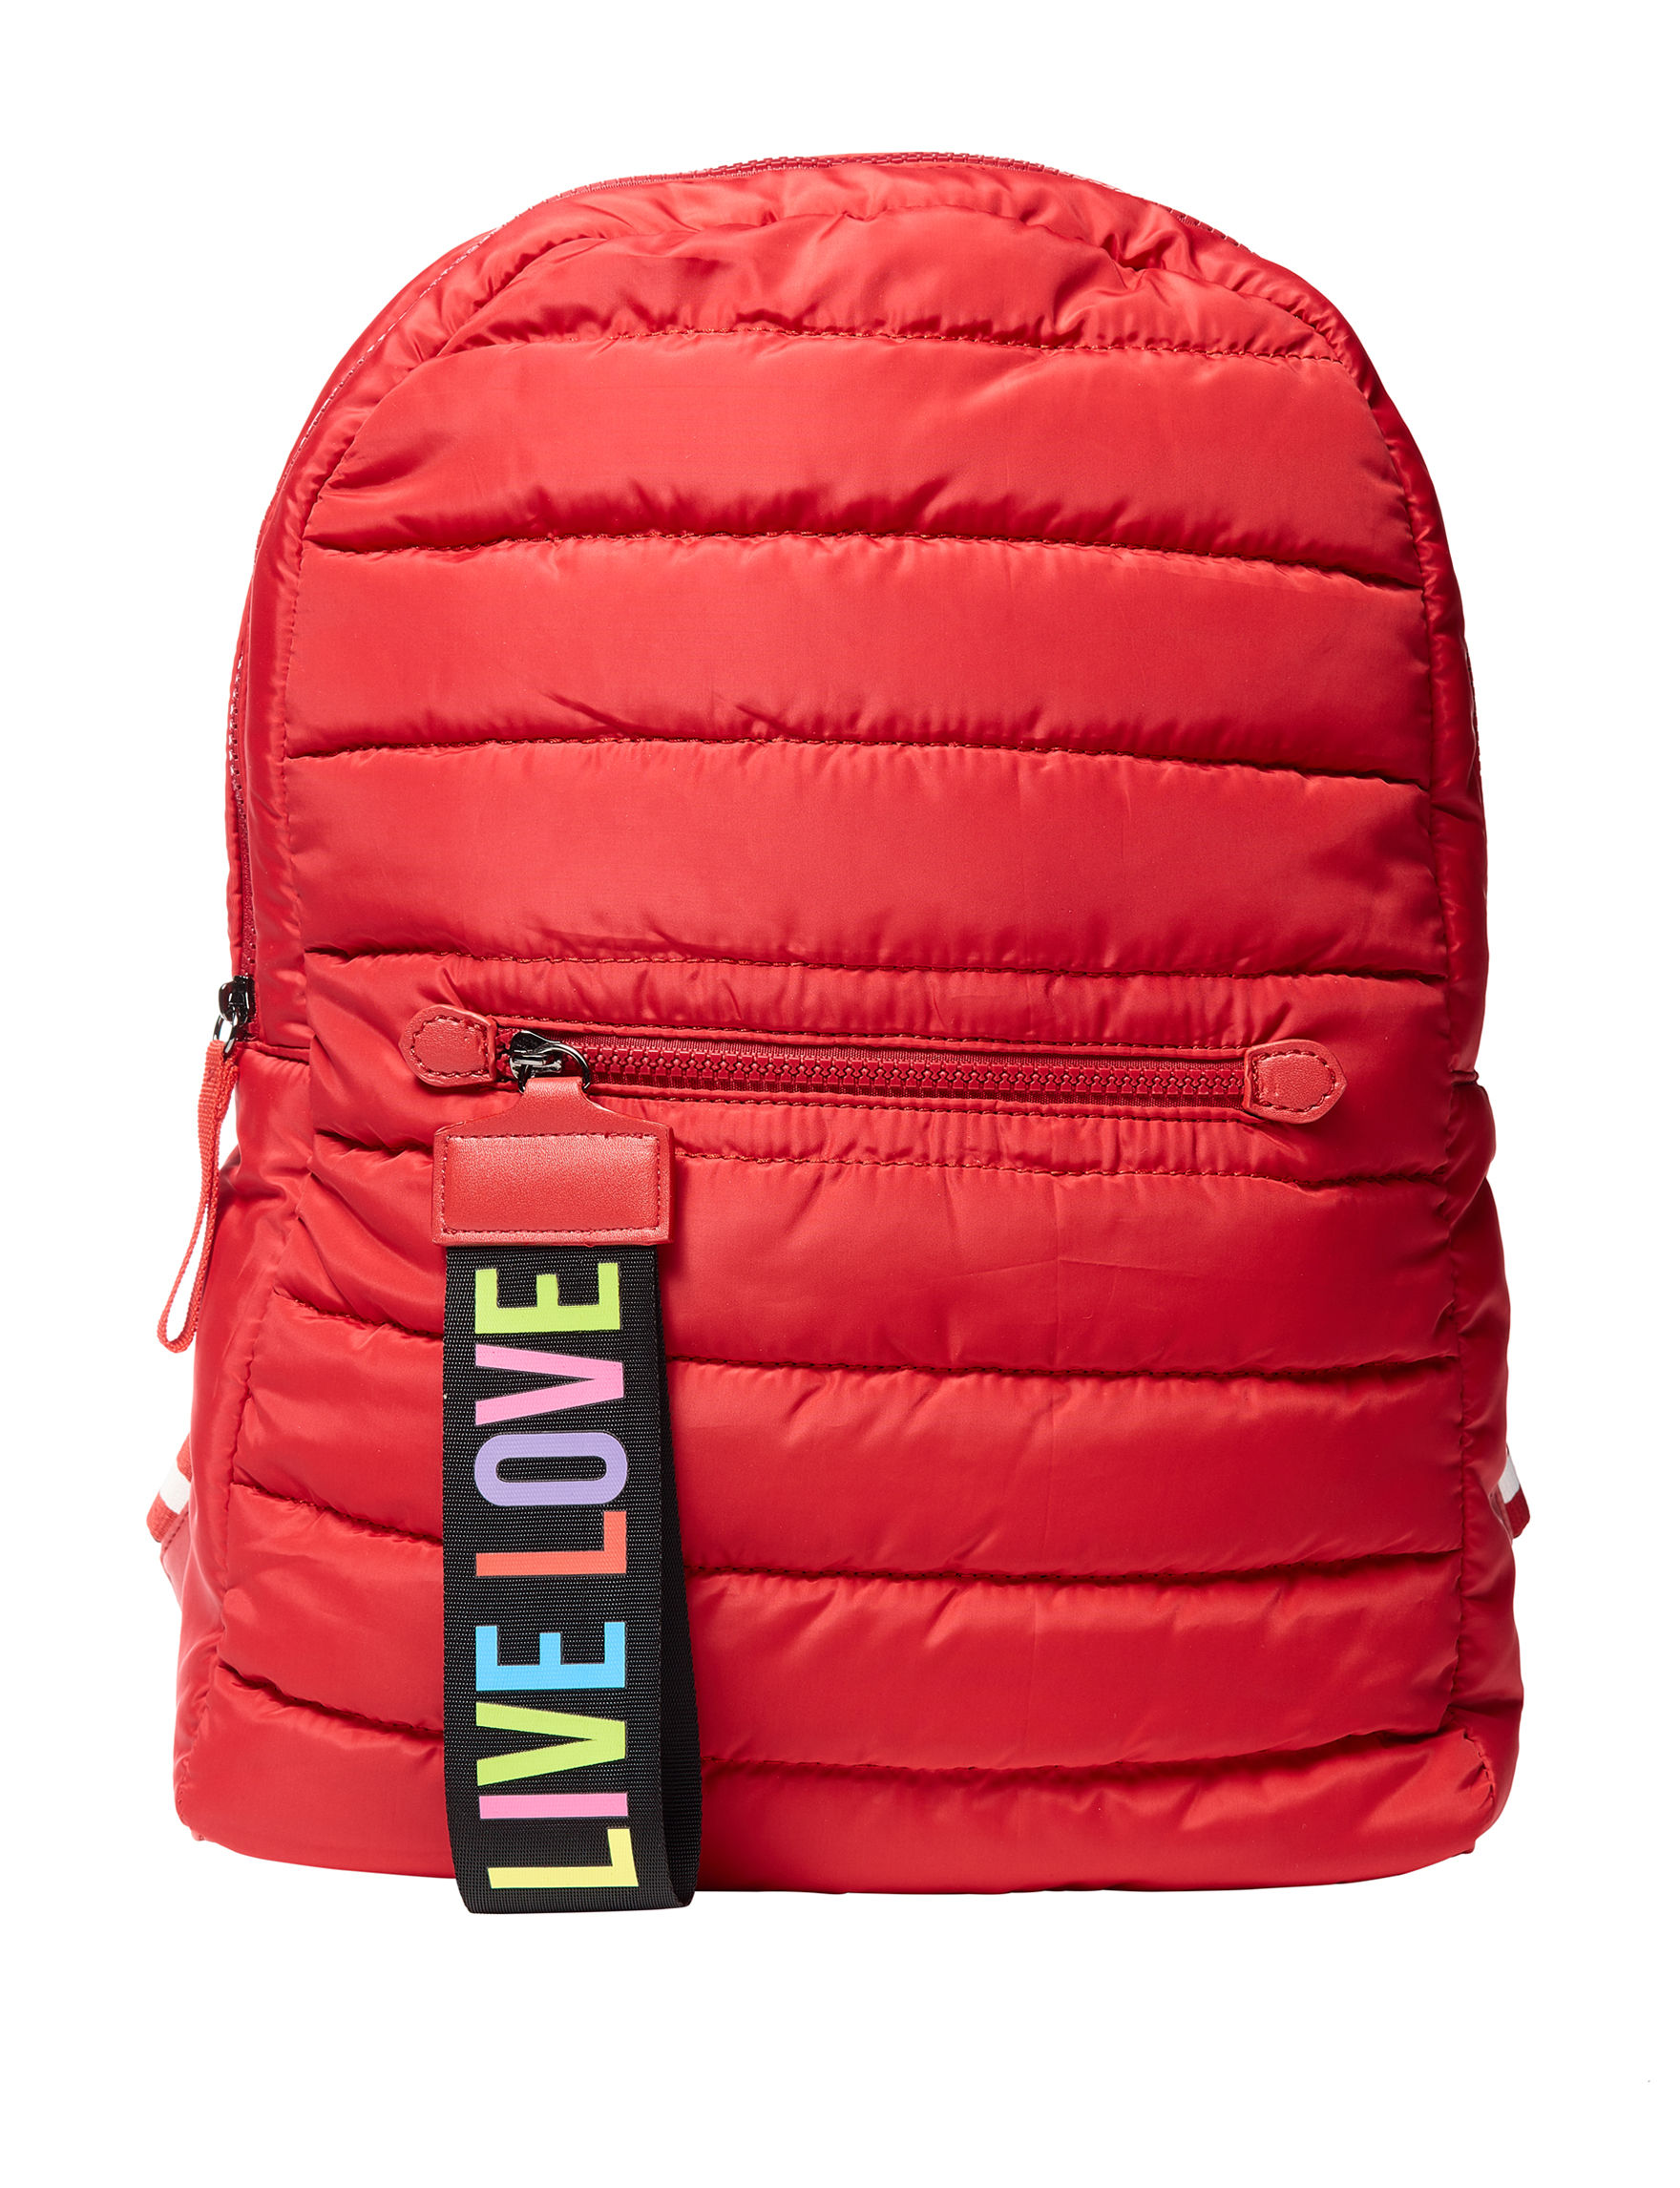 Imoshion Red Bookbags & Backpacks